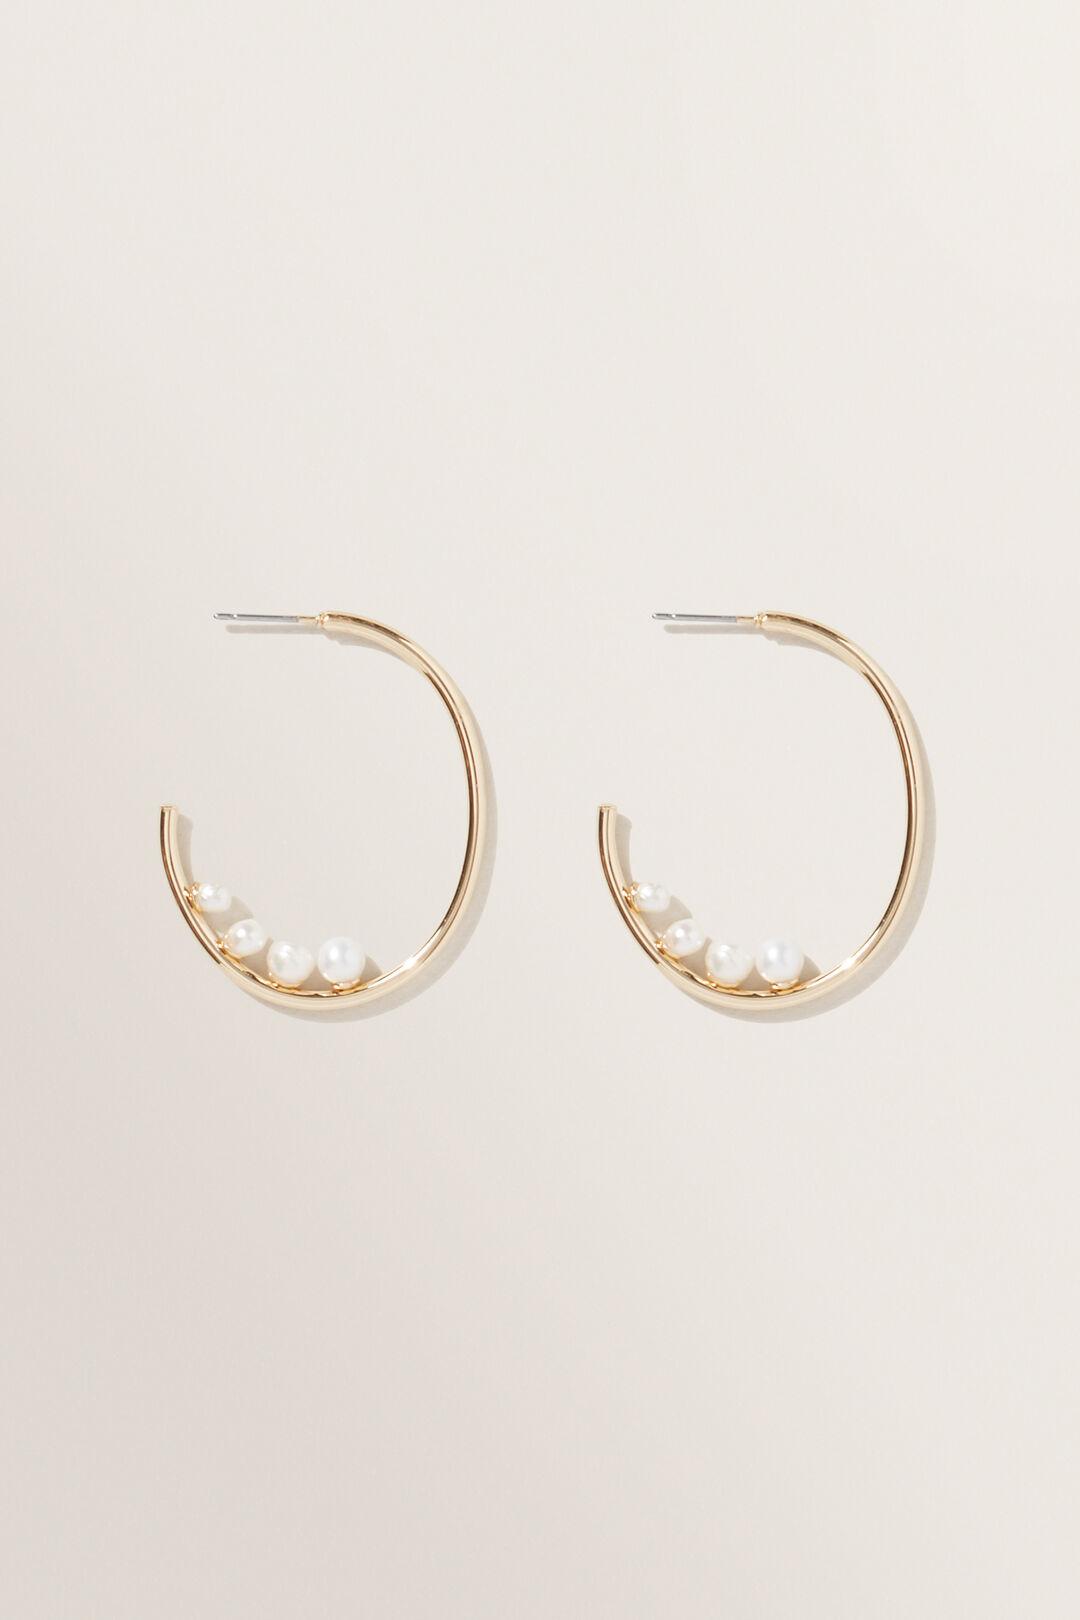 Multi  Pearl  Earrings  GOLD  hi-res